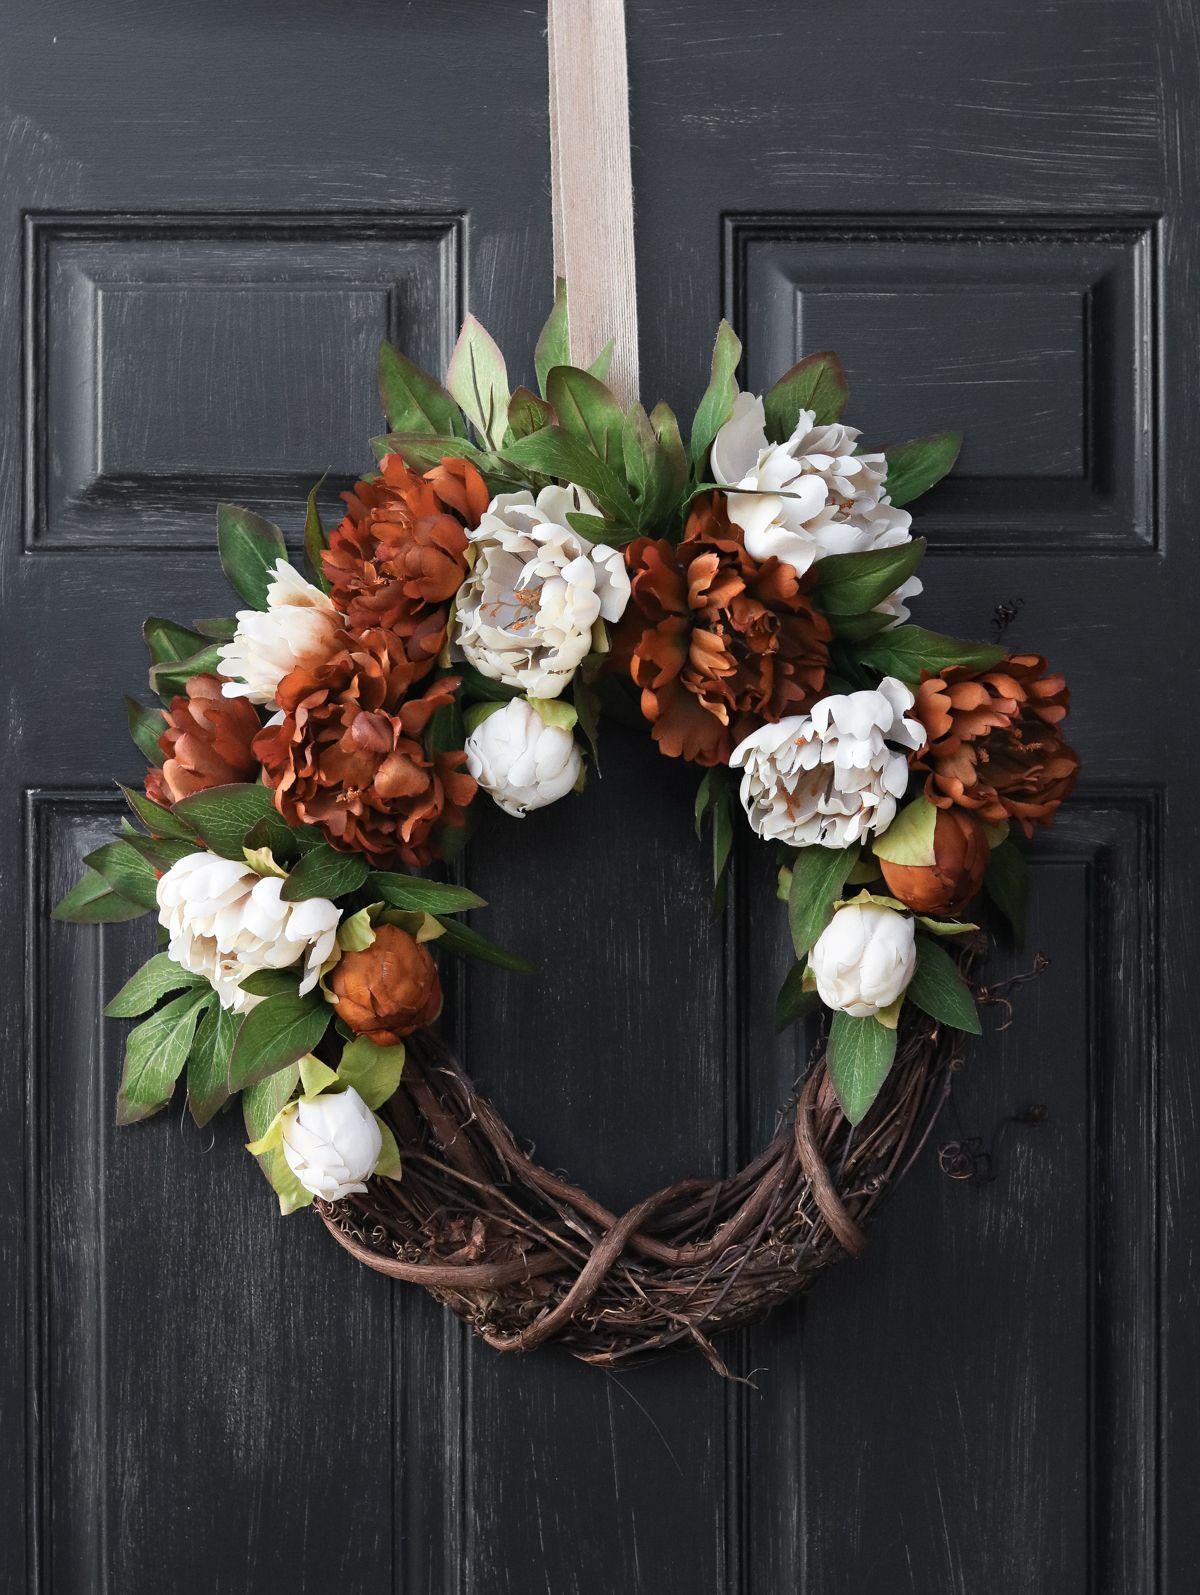 25 Best Diy Fall Wreaths Easy Autumn Wreath Craft Ideas